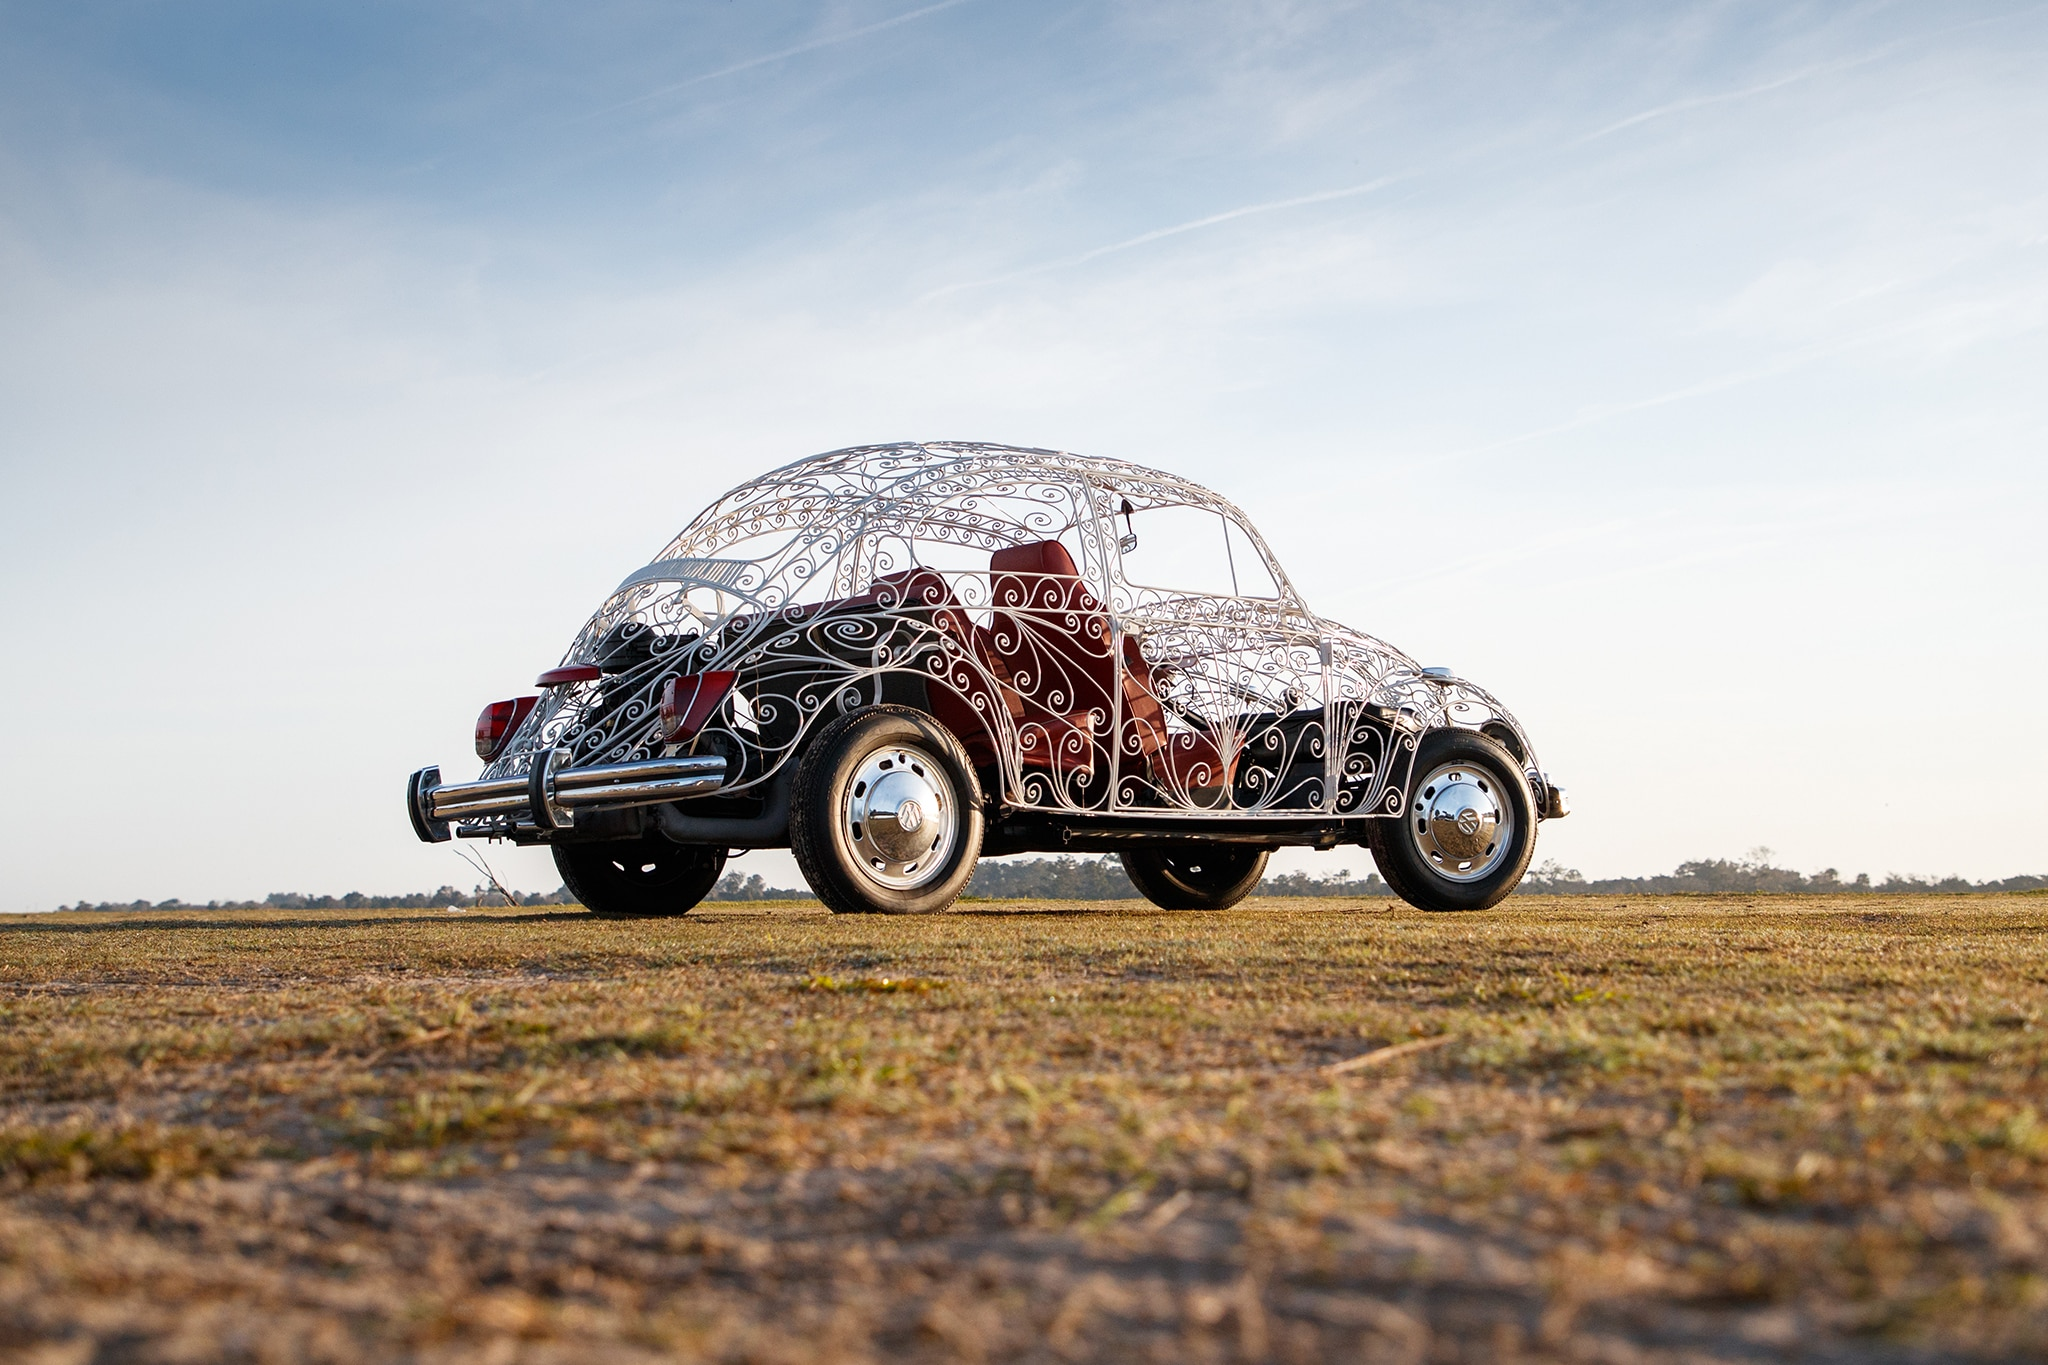 Maximum Airflow: Driving a Wrought-Iron VW Wedding Beetle